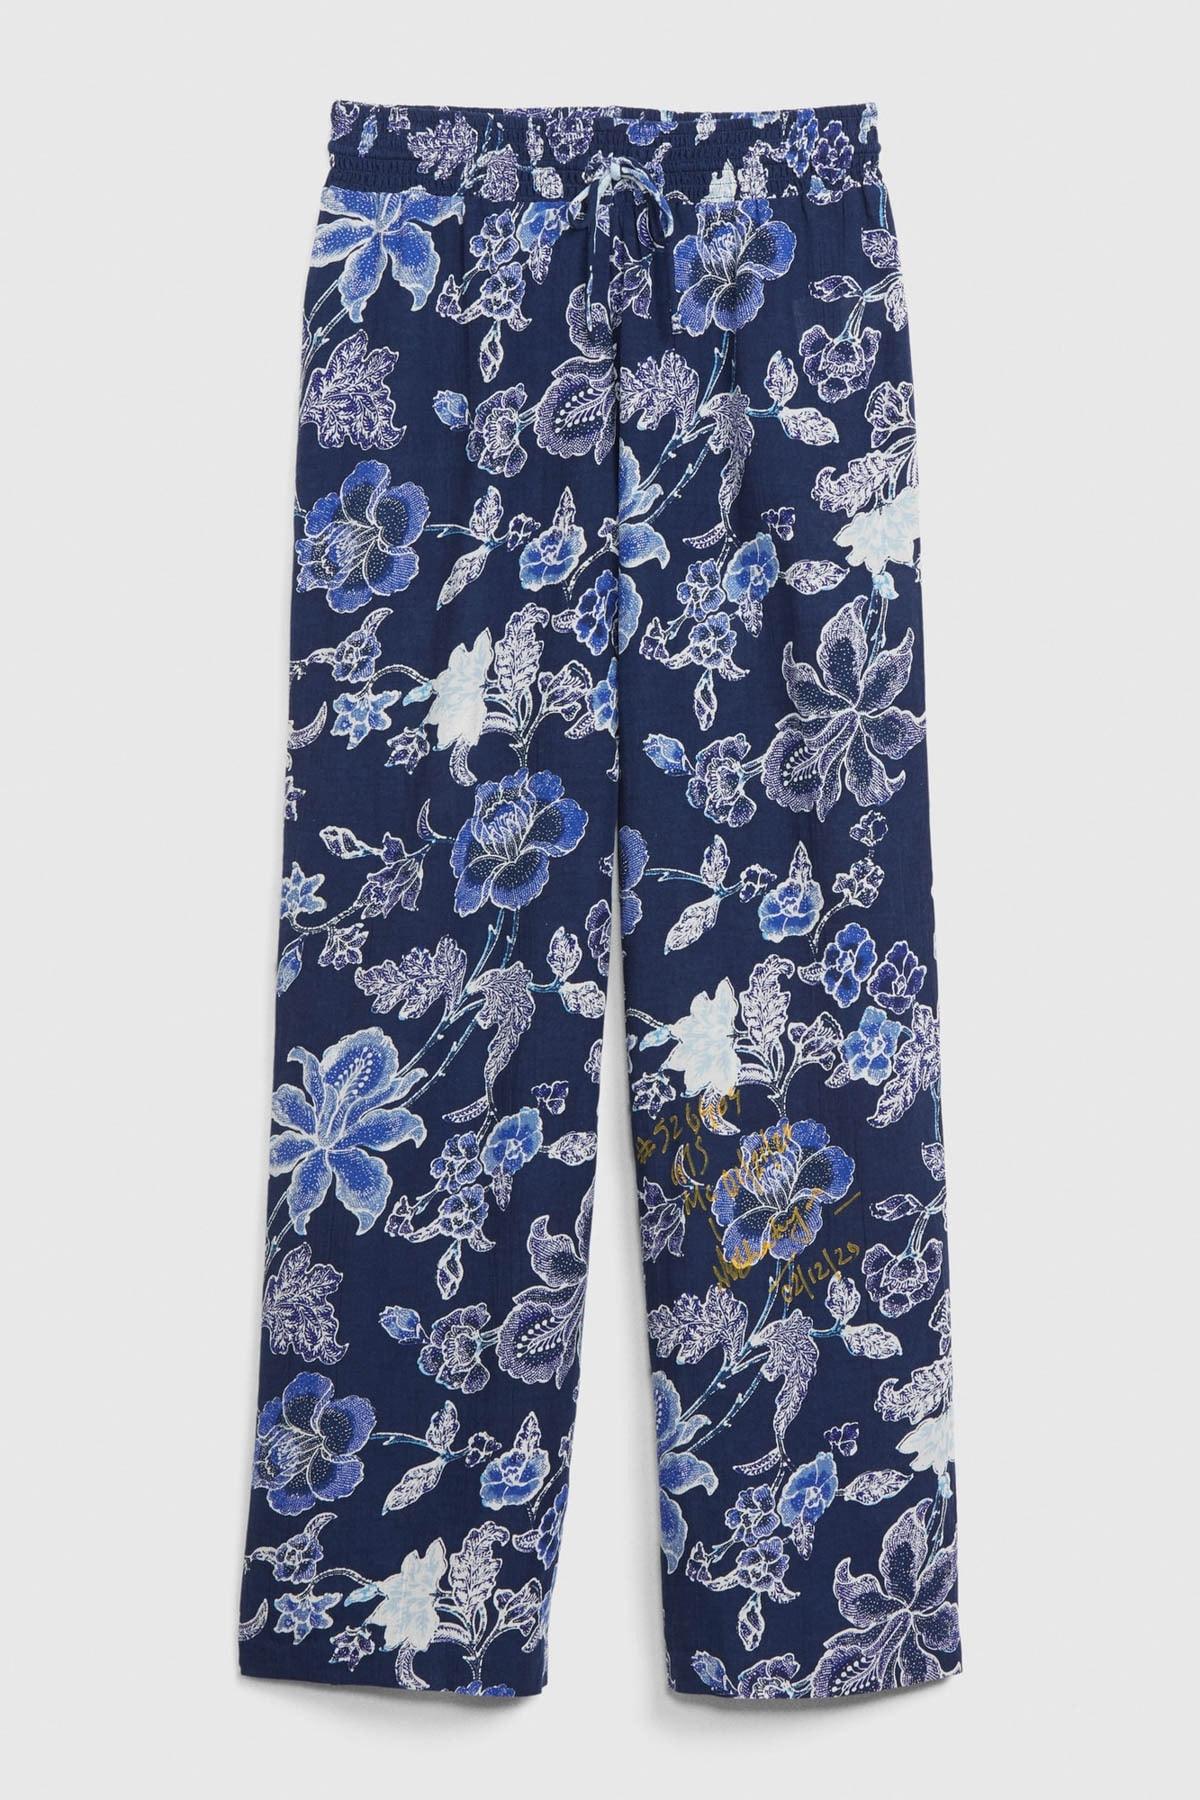 GAP Dreamwell Desenli Pijama Altı 578120 1